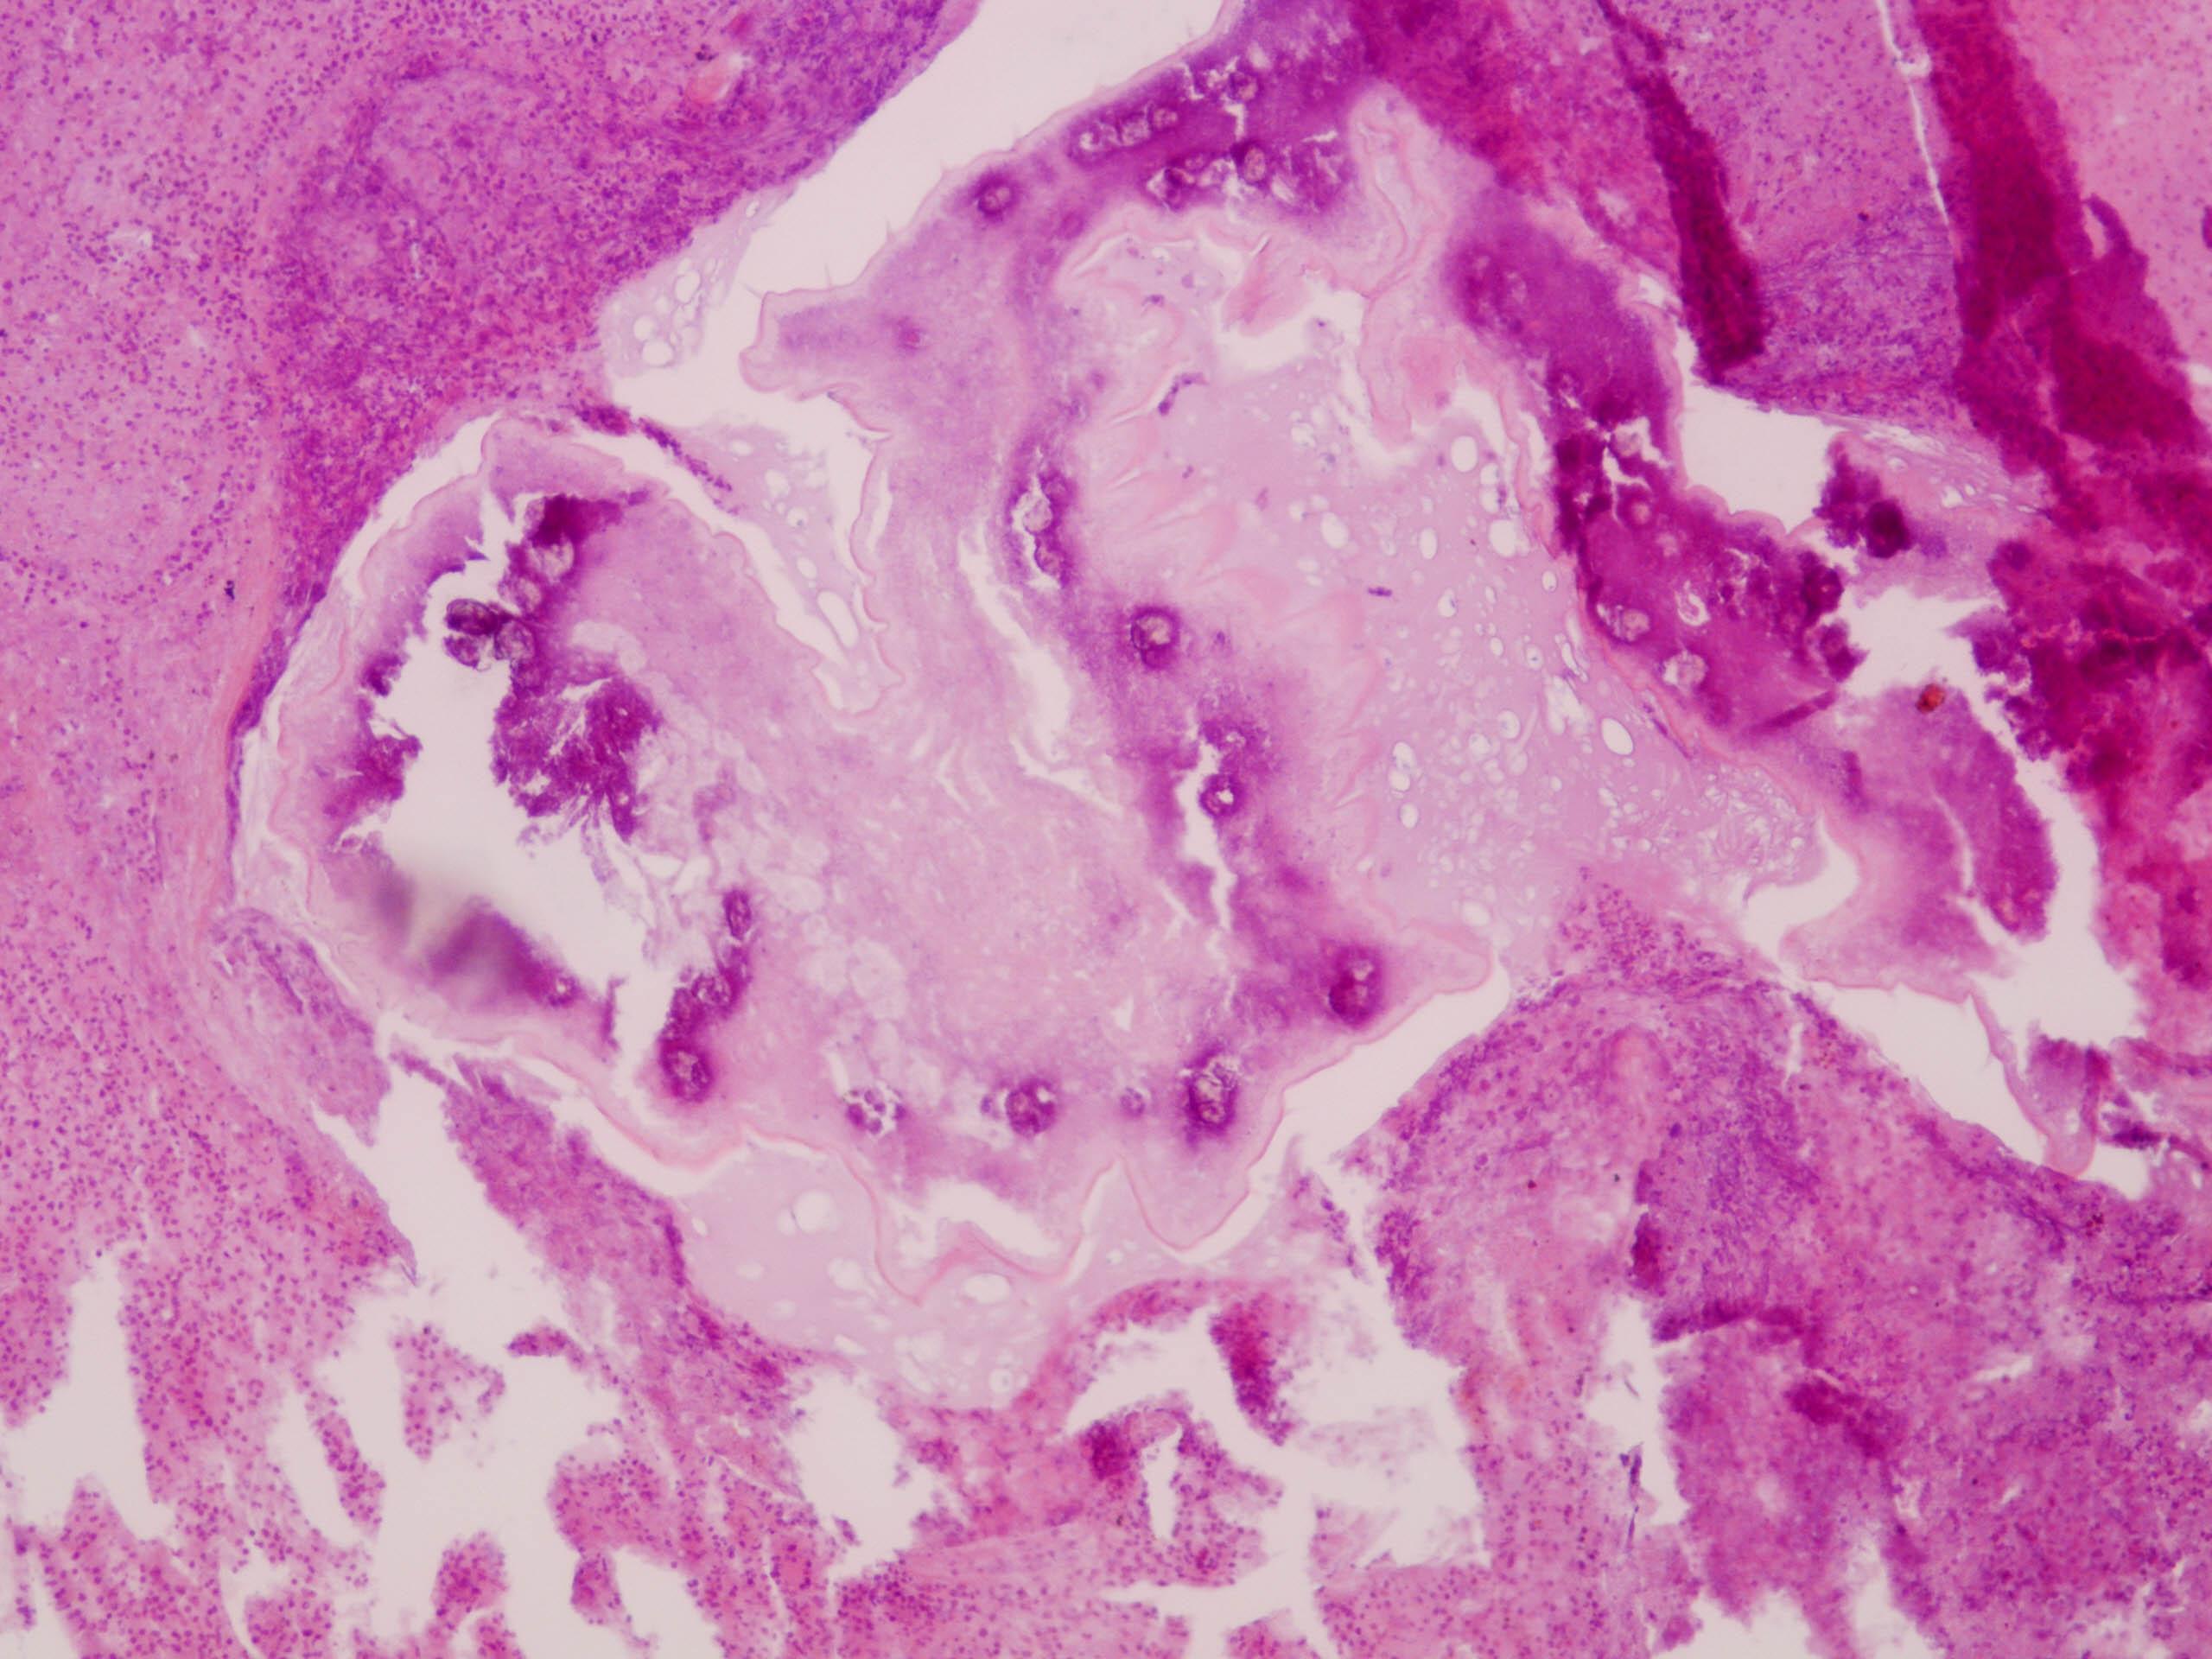 Pulmonary embolization